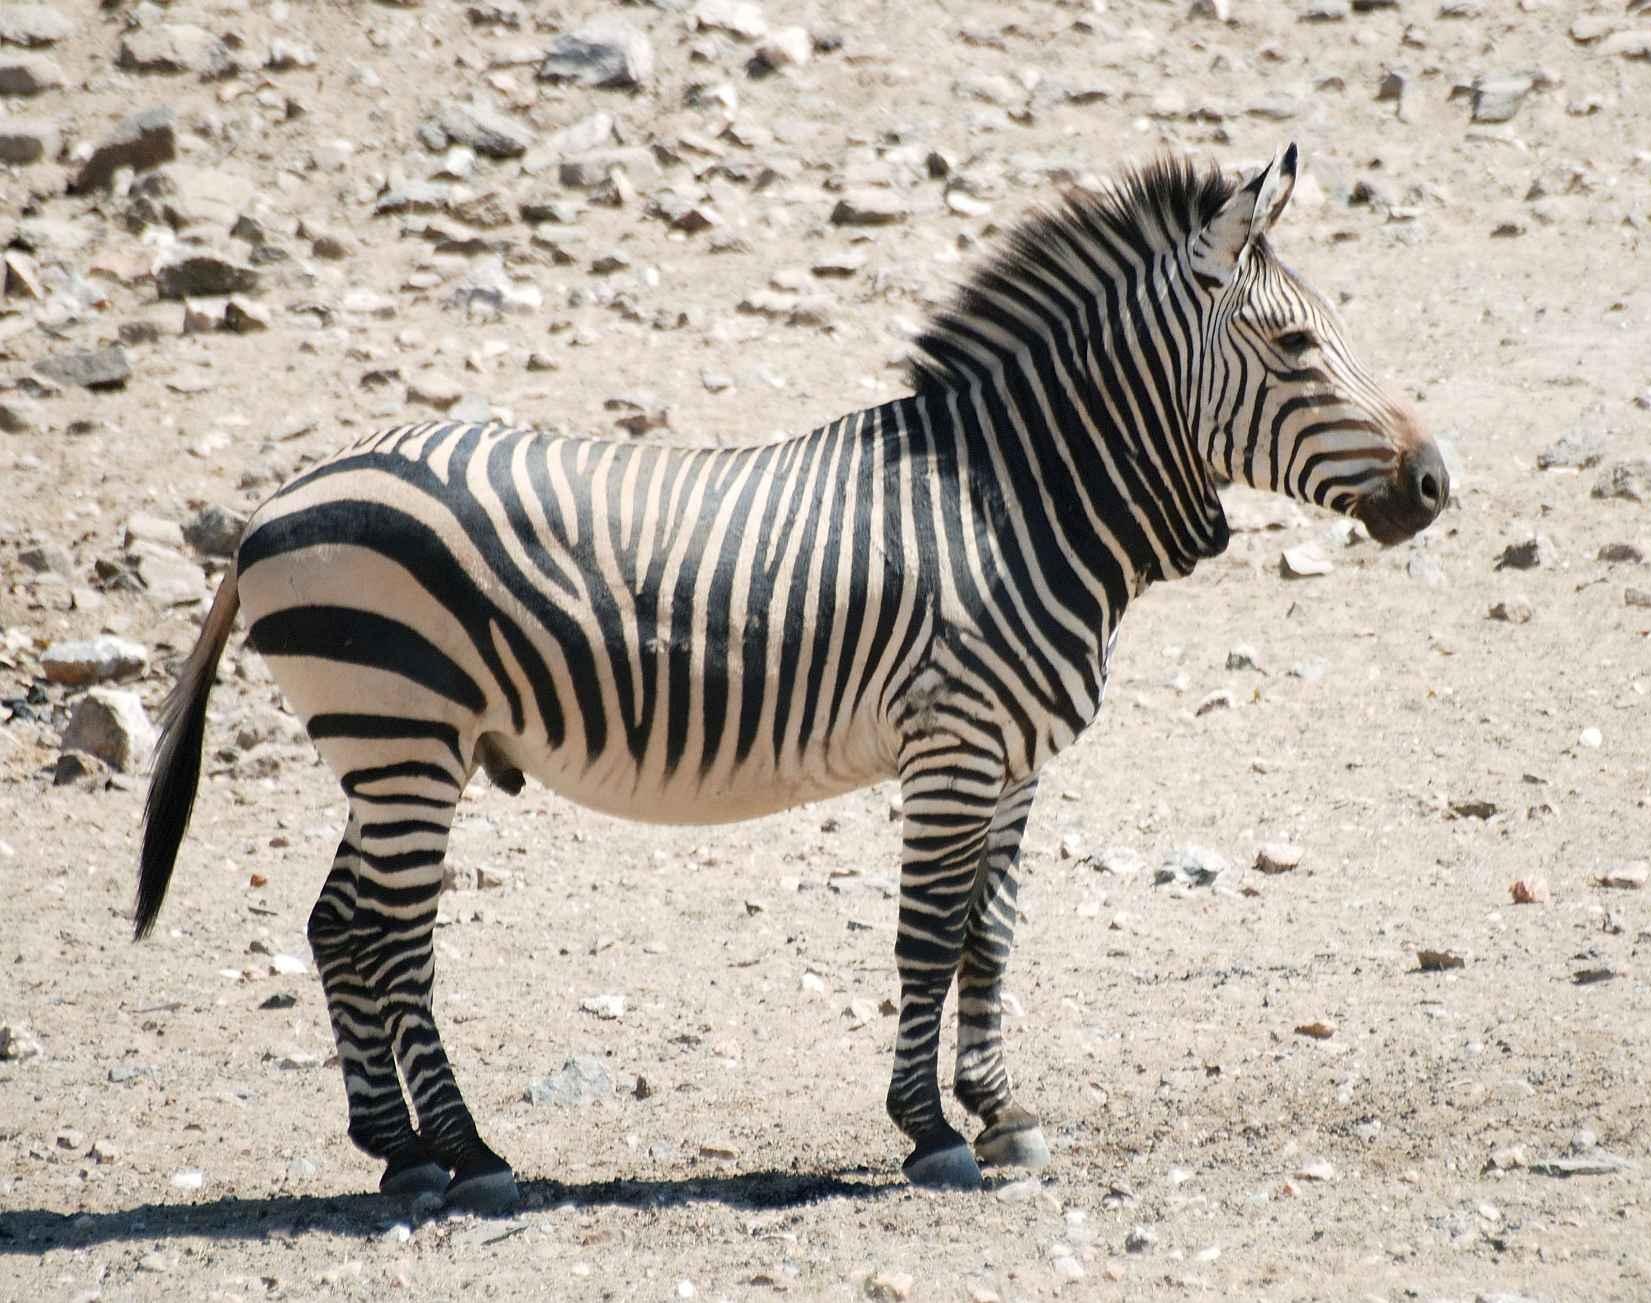 14 Zany Facts About Zebras | Mental Floss